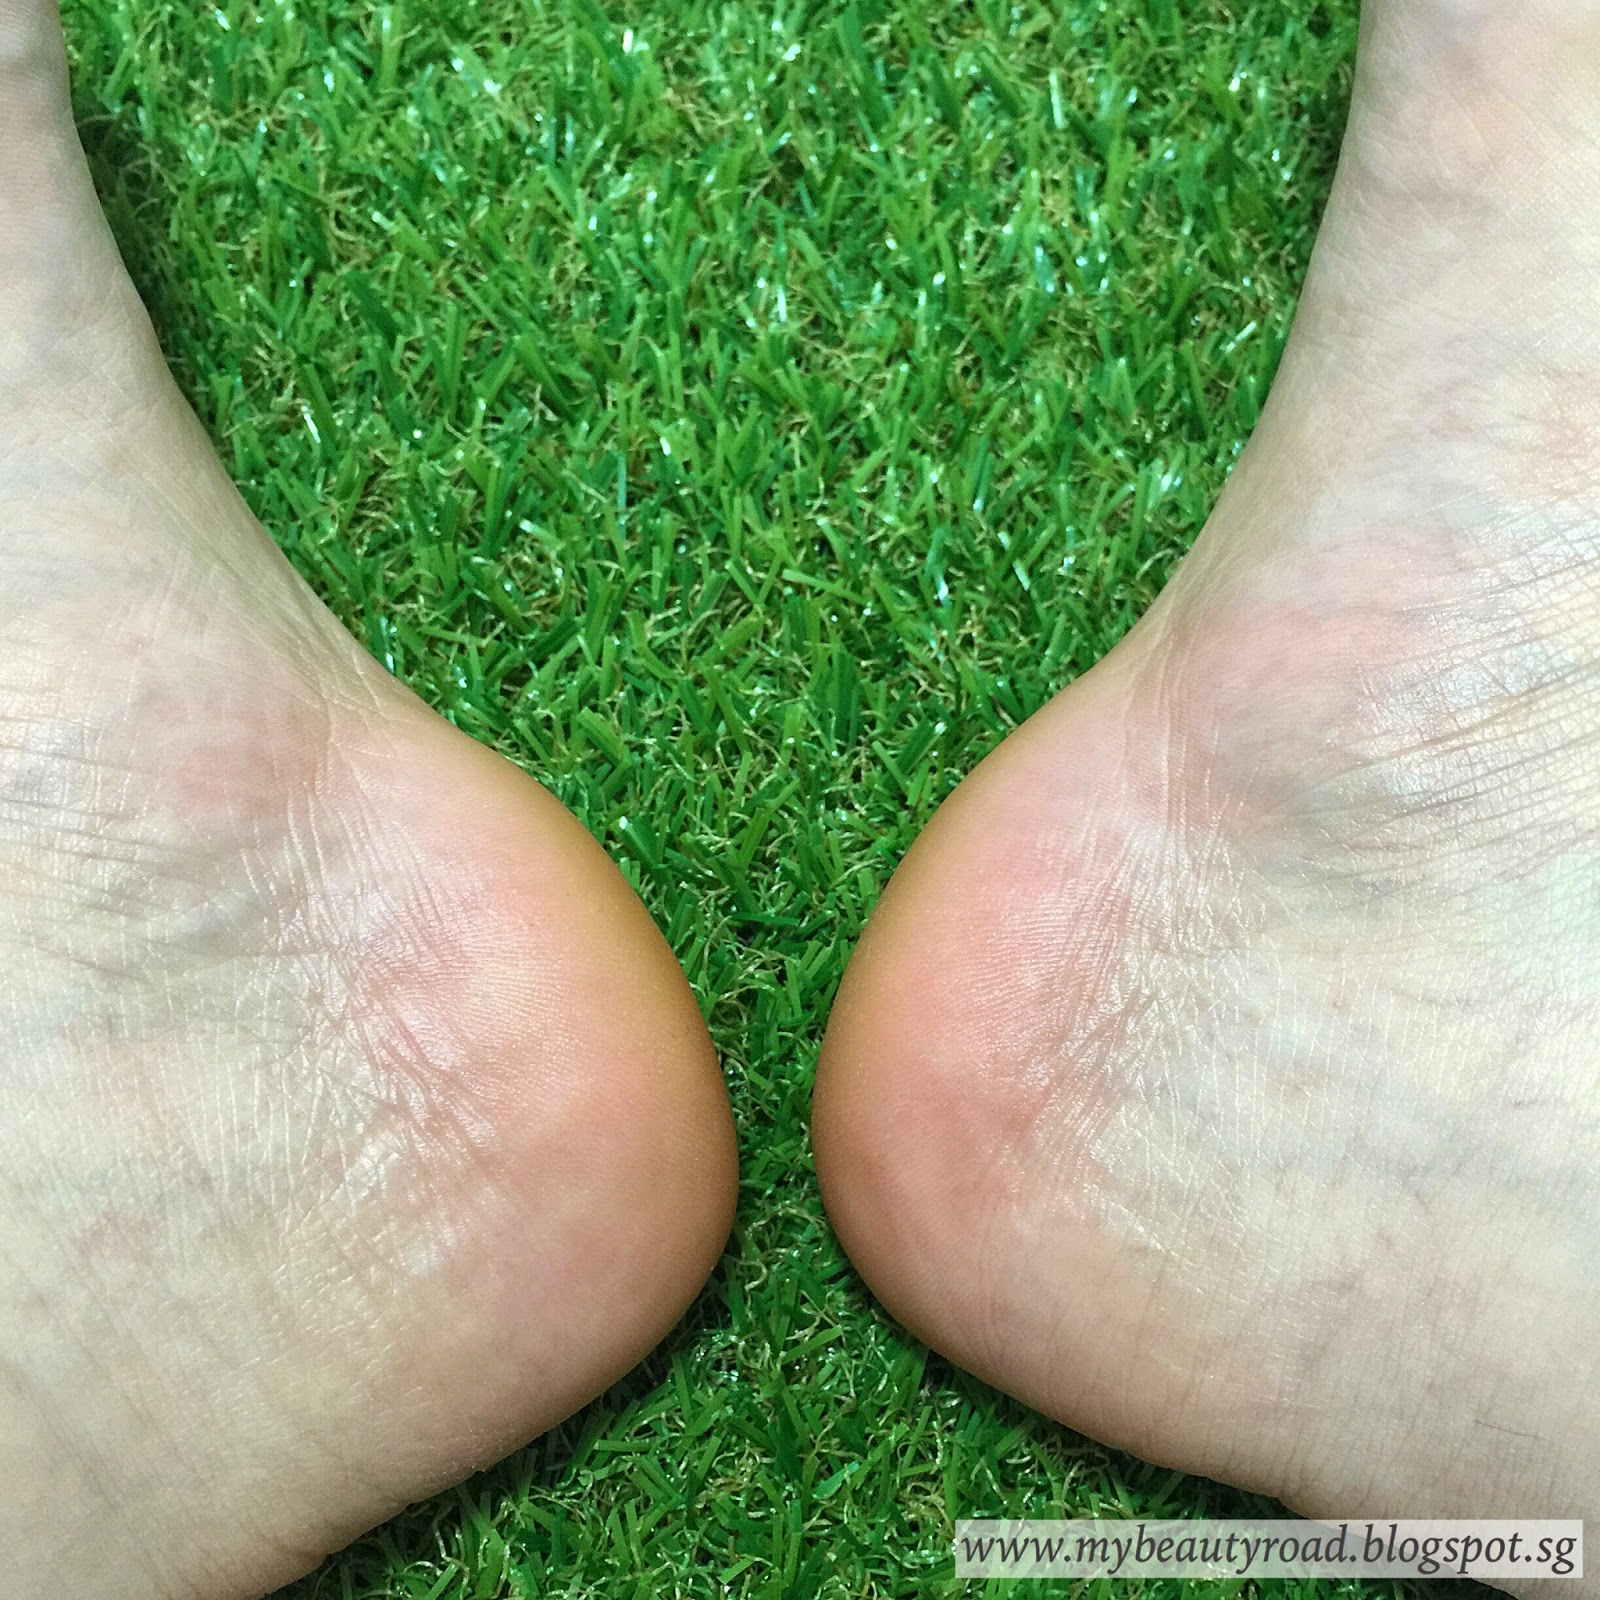 Can help foot fetish blogspot